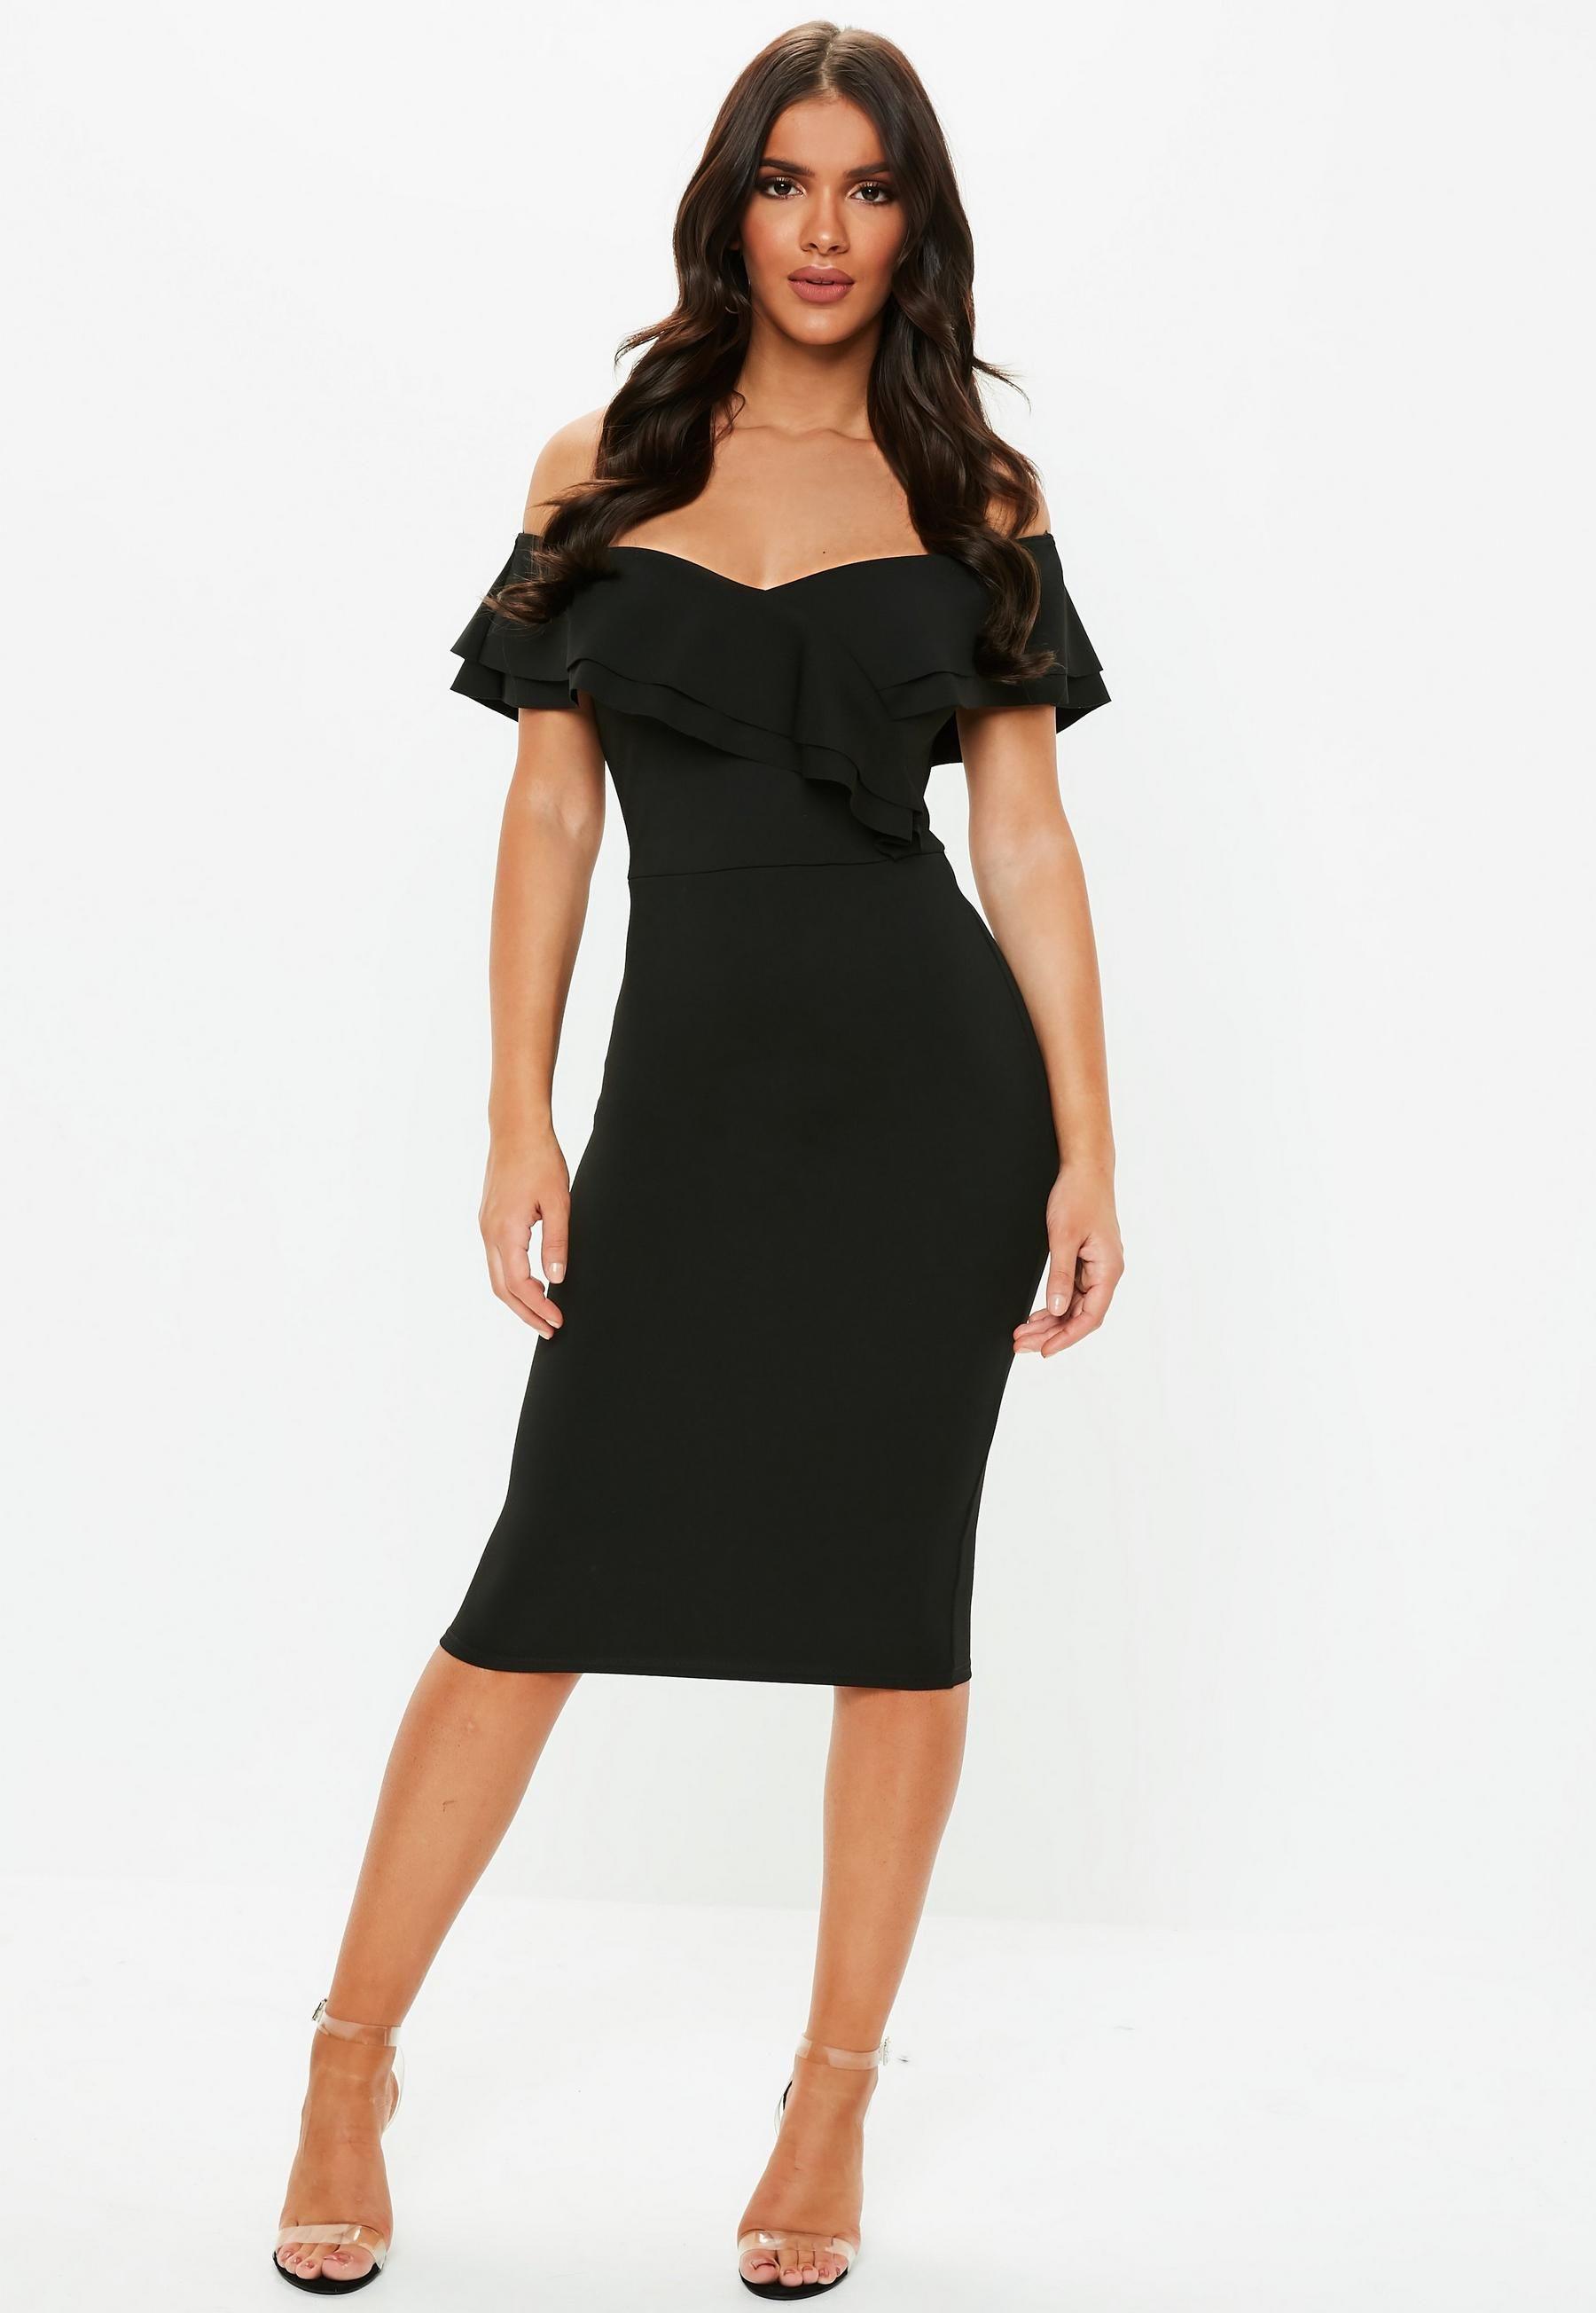 Black Frill Bardot Midi Dress Missguided Trending Dresses Dresses Formal Elegant Womens Dresses [ 2608 x 1800 Pixel ]